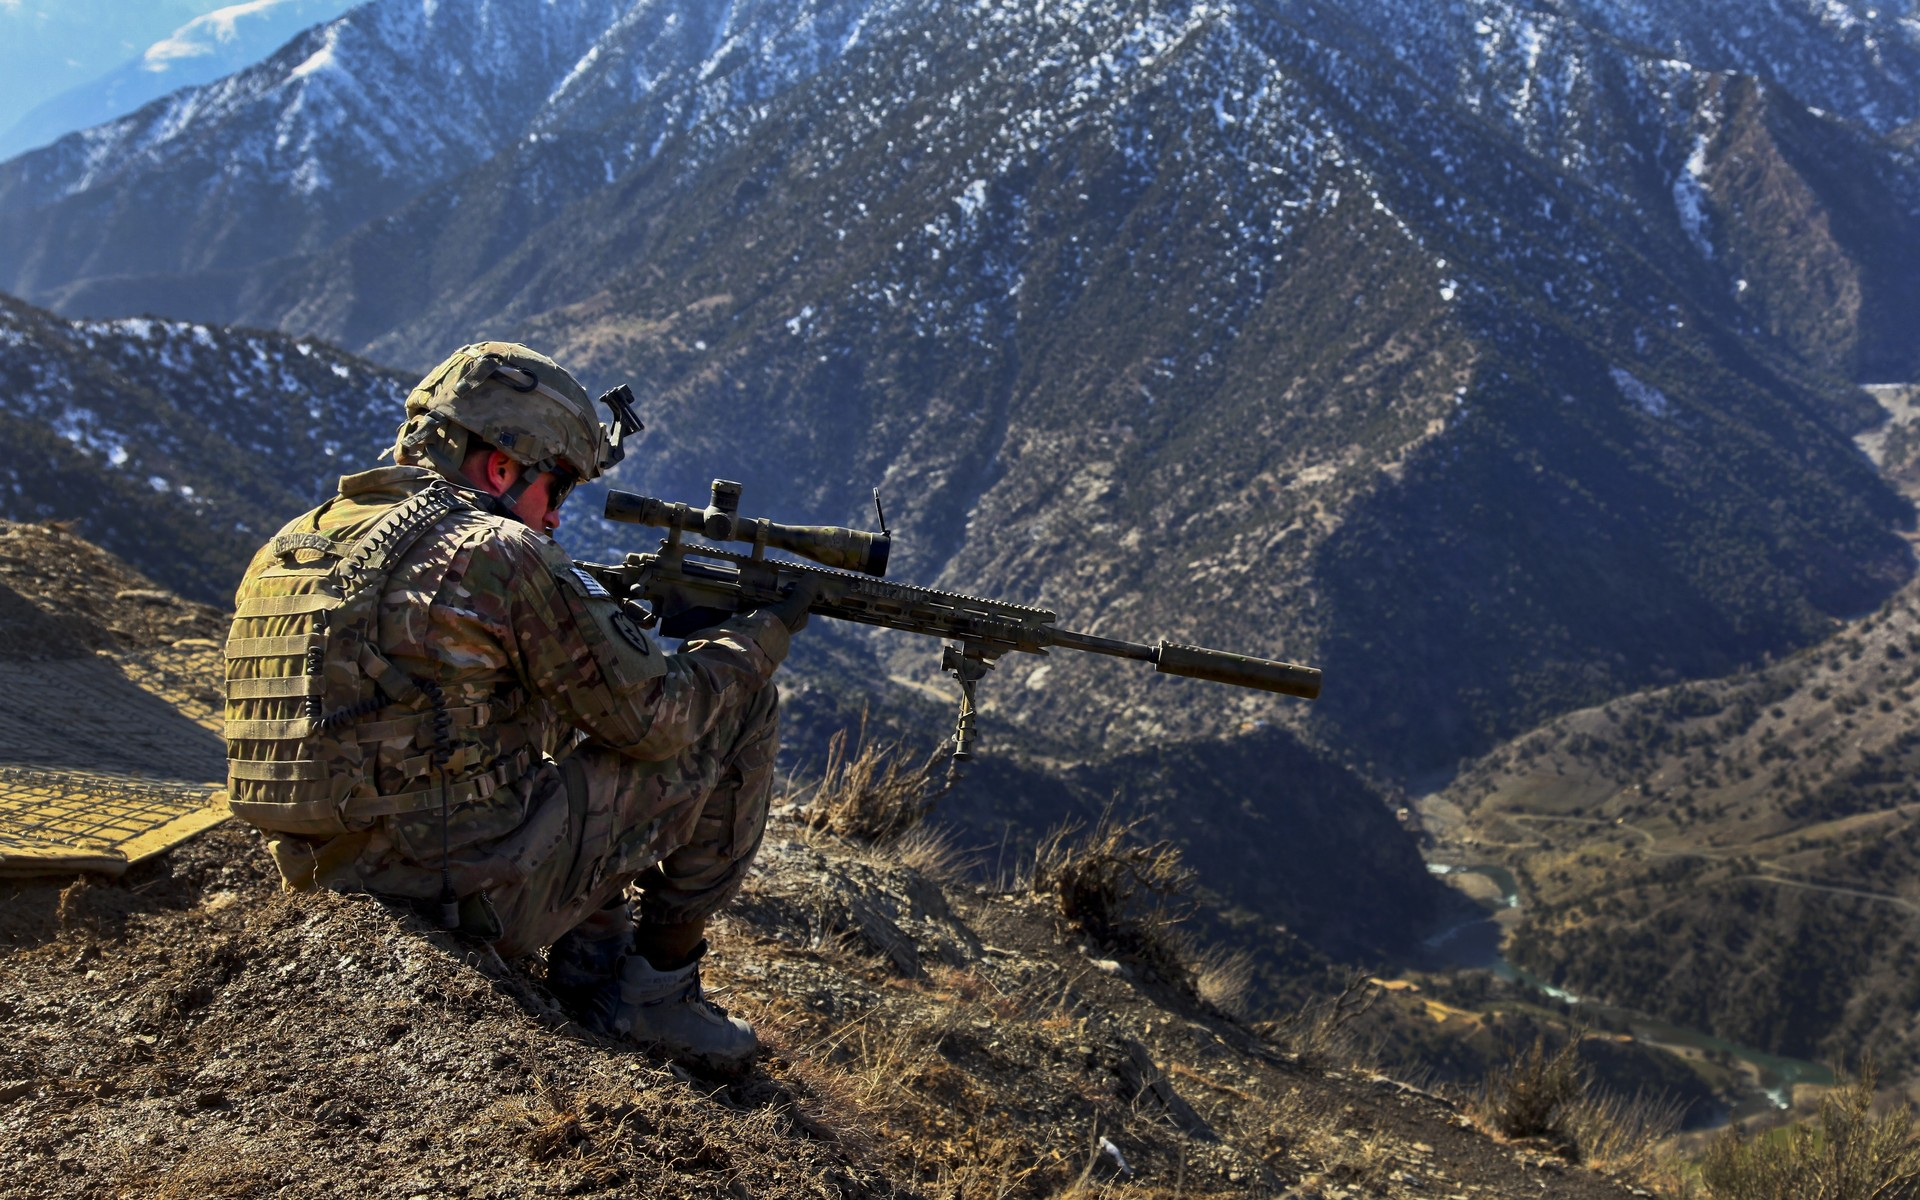 Cool Sniper Wallpaper 2560x1600px 777297 1920x1200